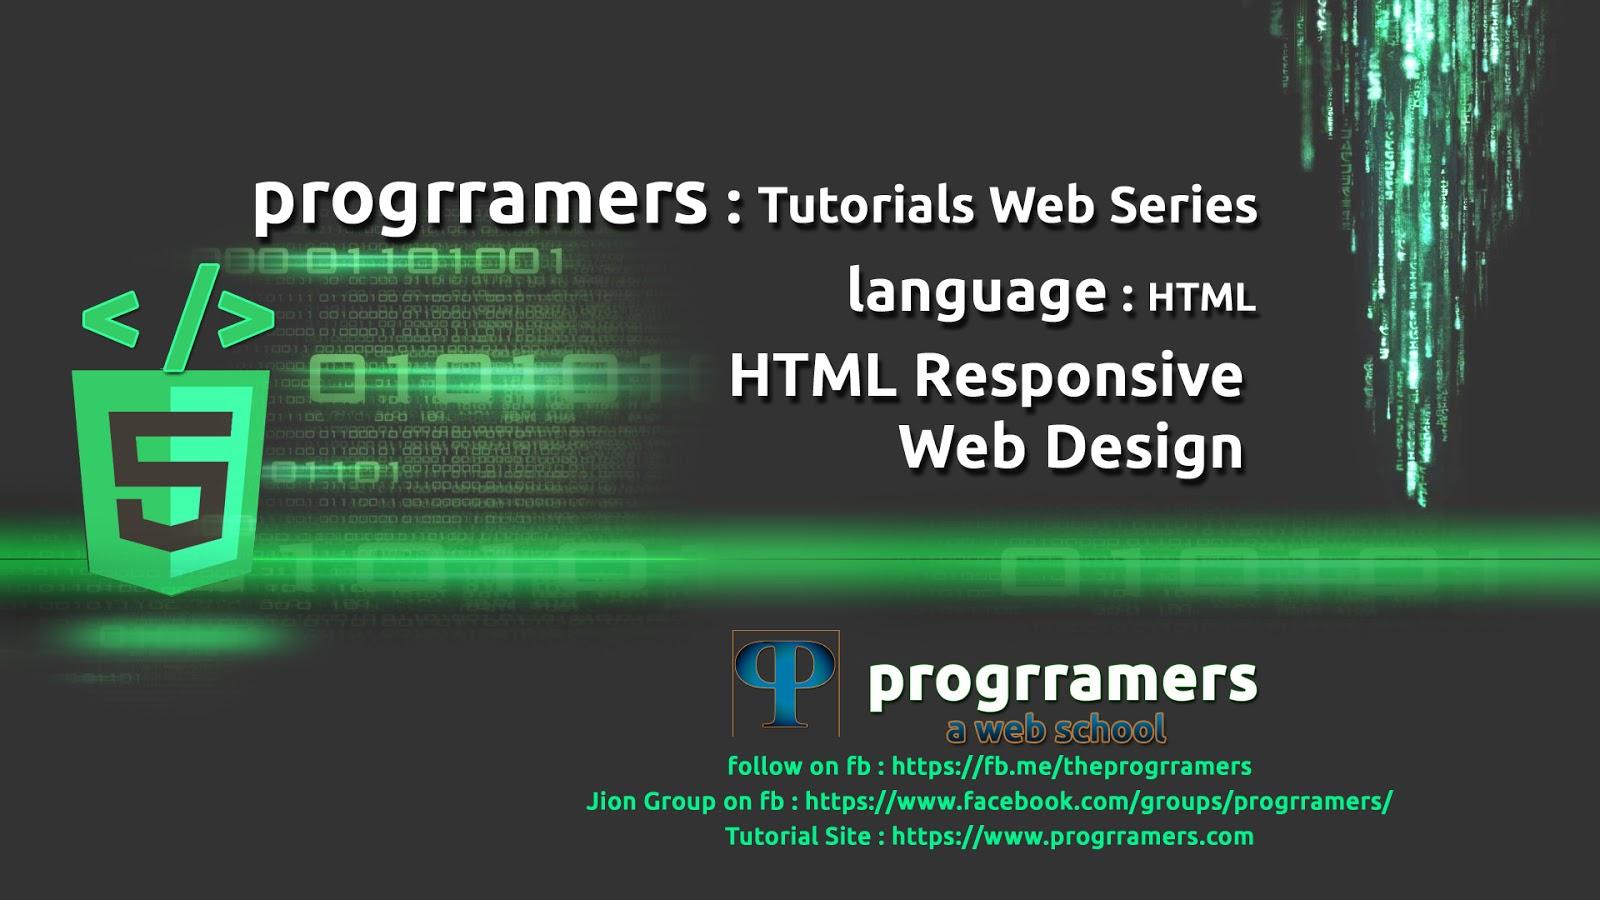 Html5 Tutorial Html Responsive Web Design Rwd Progrramers Web Development Tutorials For Framework7 Meanstack Mongodb Express Angular Nodejs